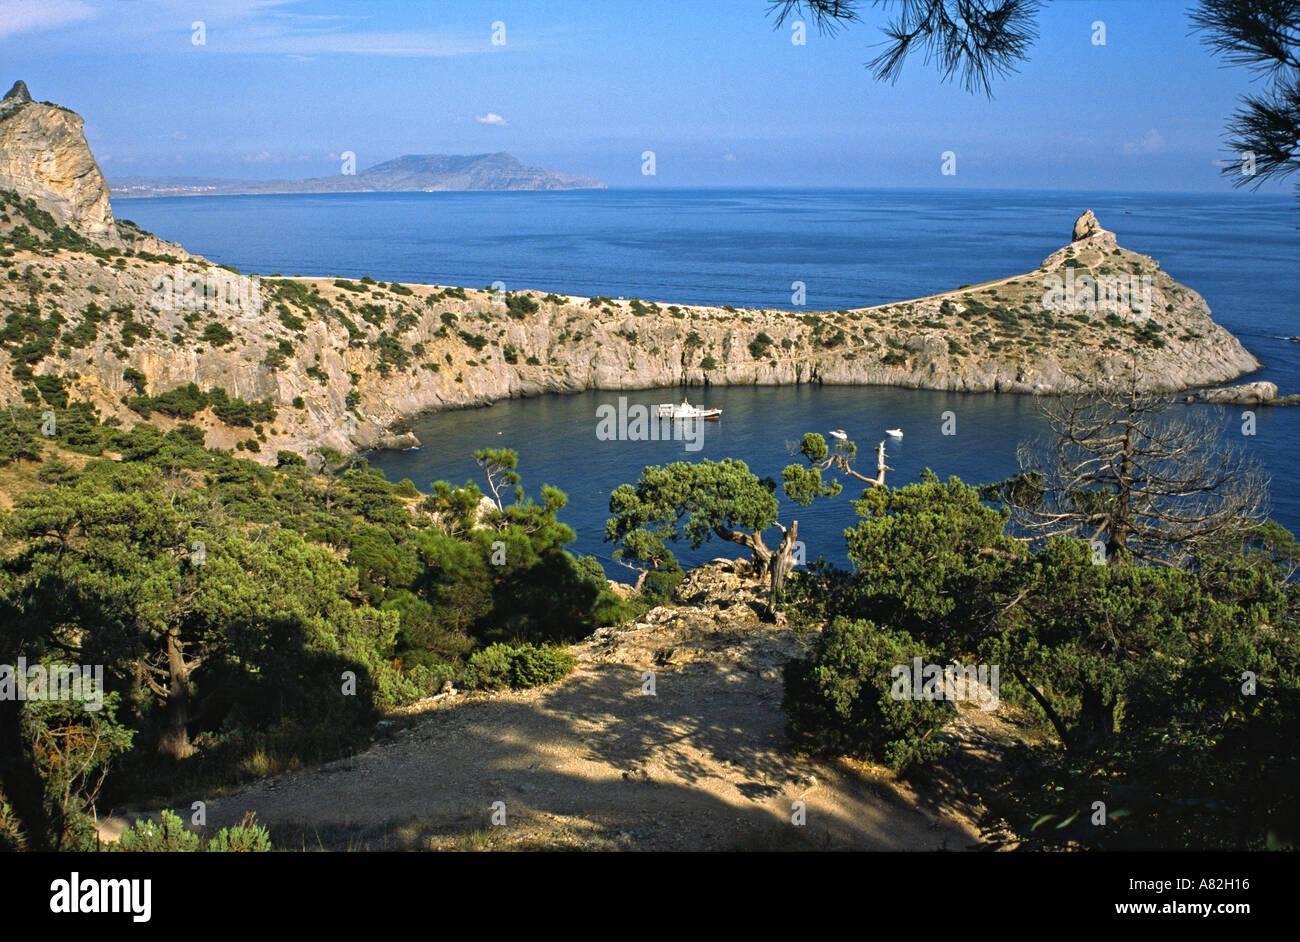 Tsar's beach, Crimea, Ukraine Stock Photo